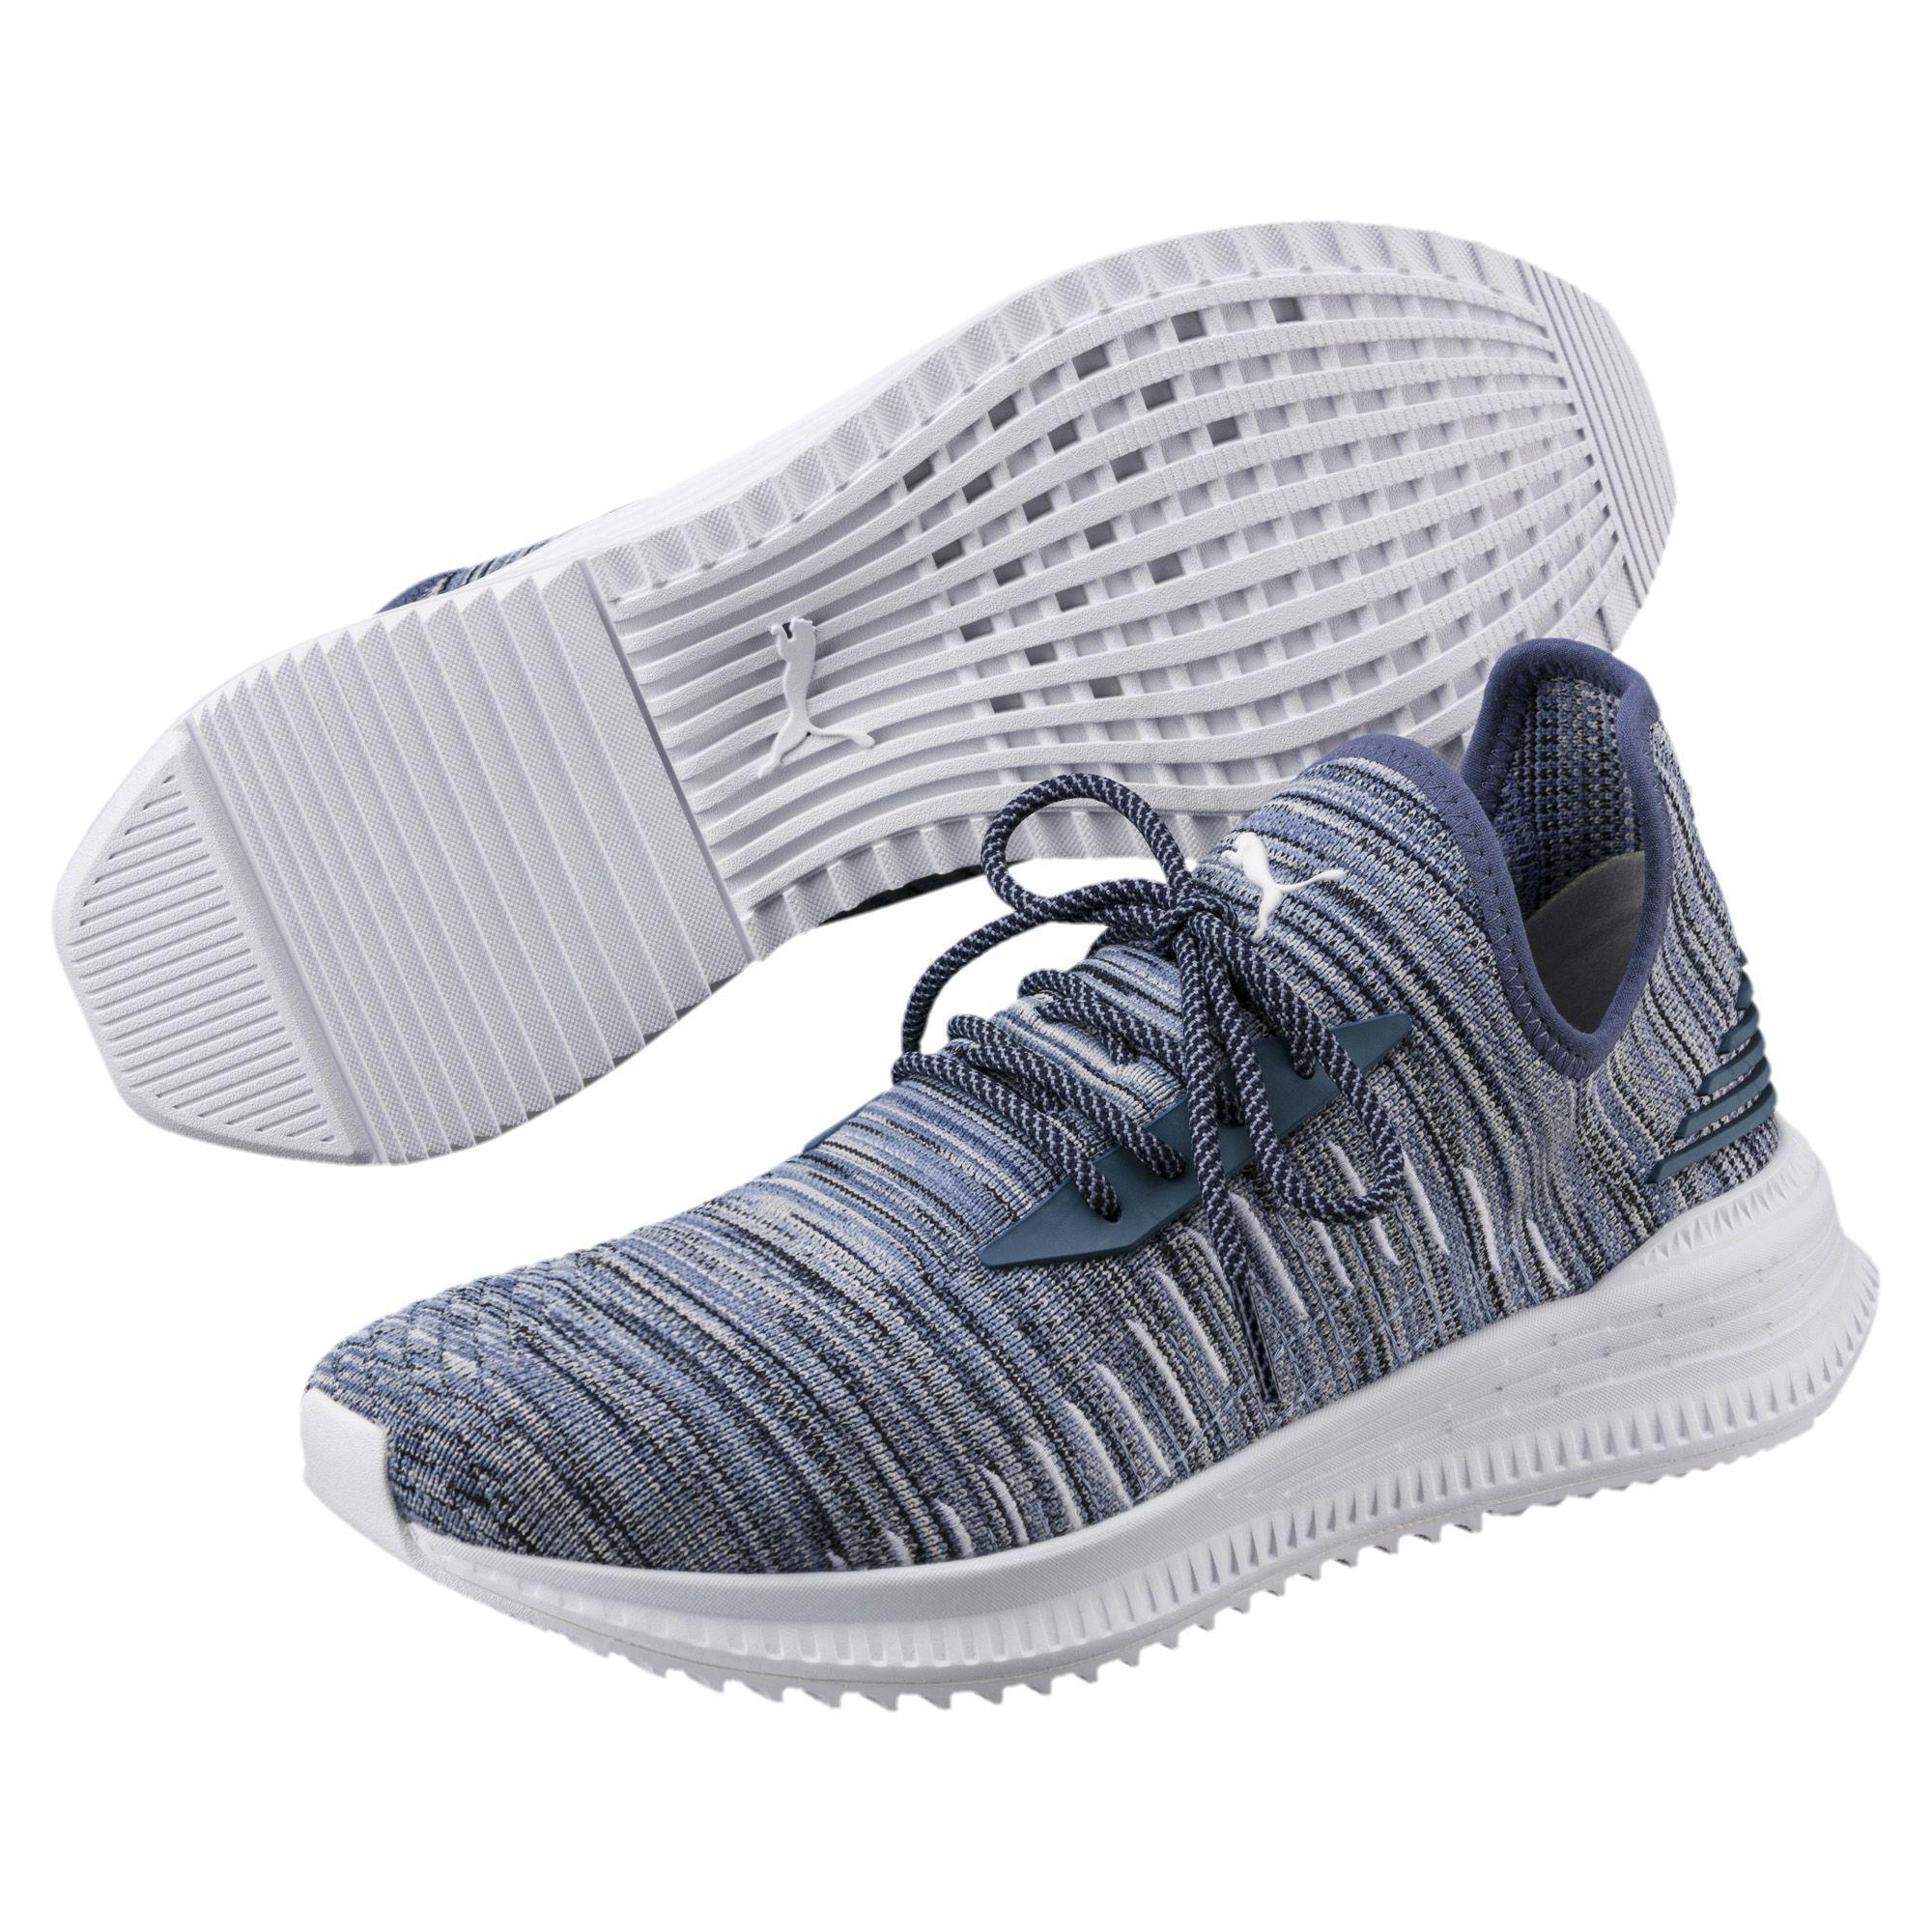 599725b728d0 Lyst - PUMA Avid Evoknit Summer Running Shoes in Blue